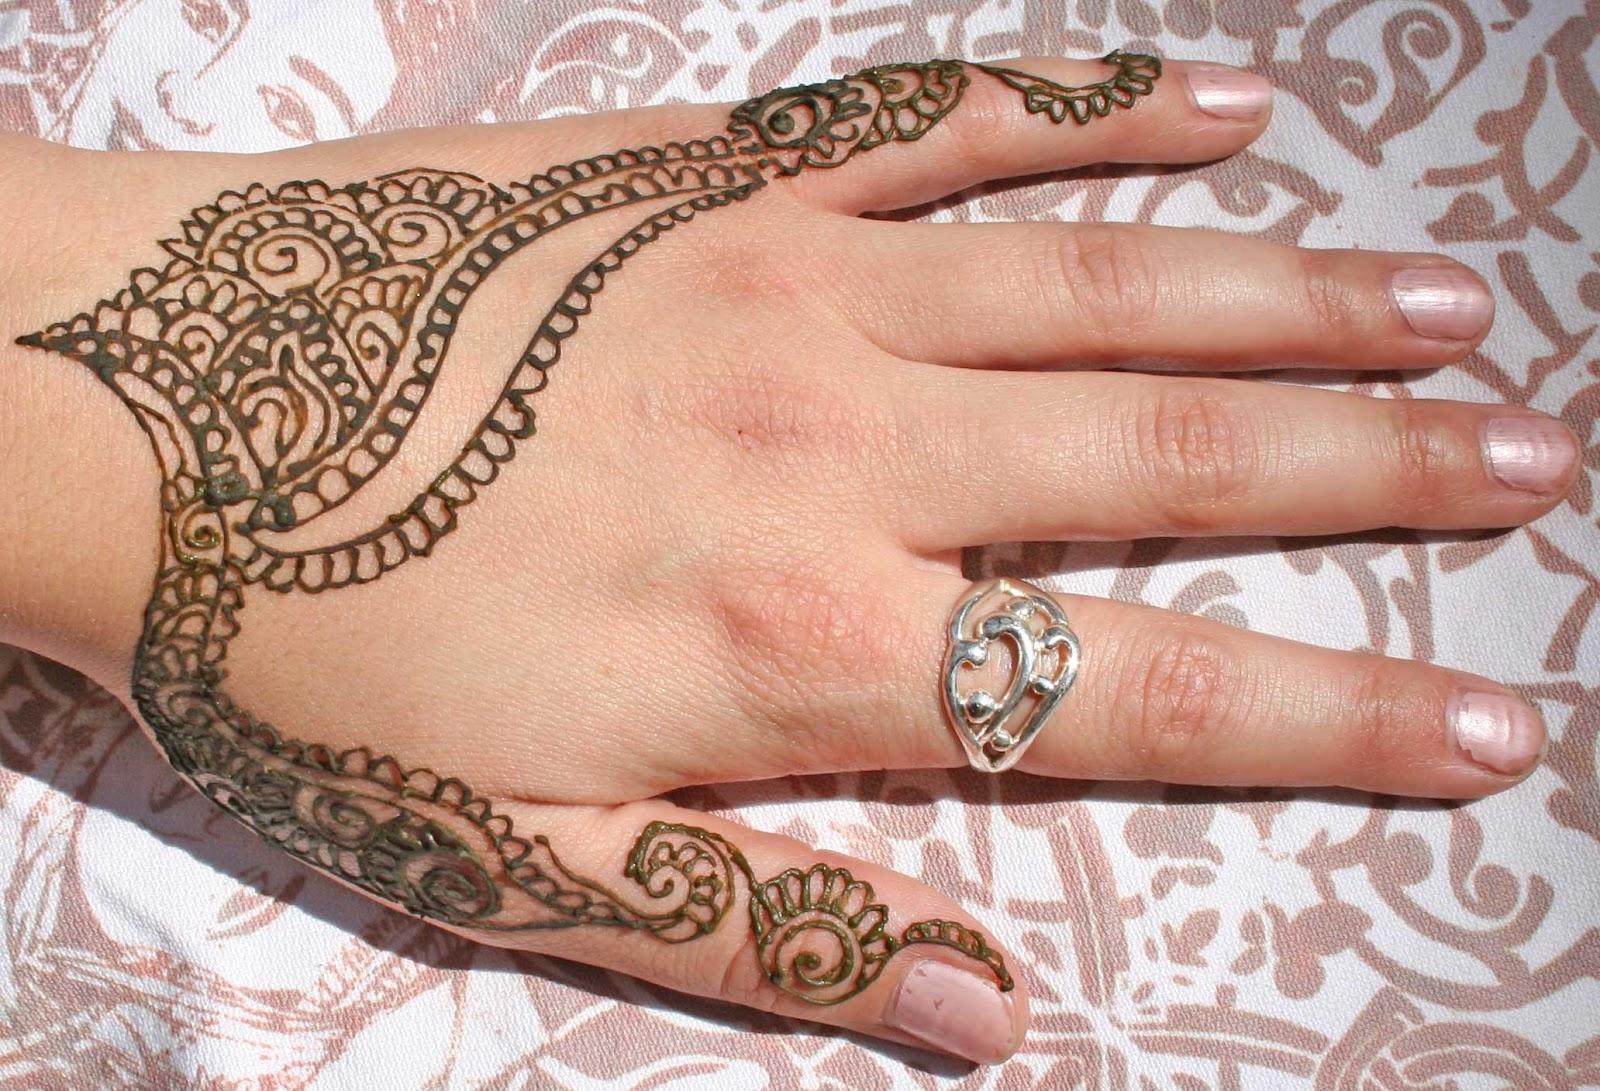 mehndi designs 2012 henna tattoos. Black Bedroom Furniture Sets. Home Design Ideas